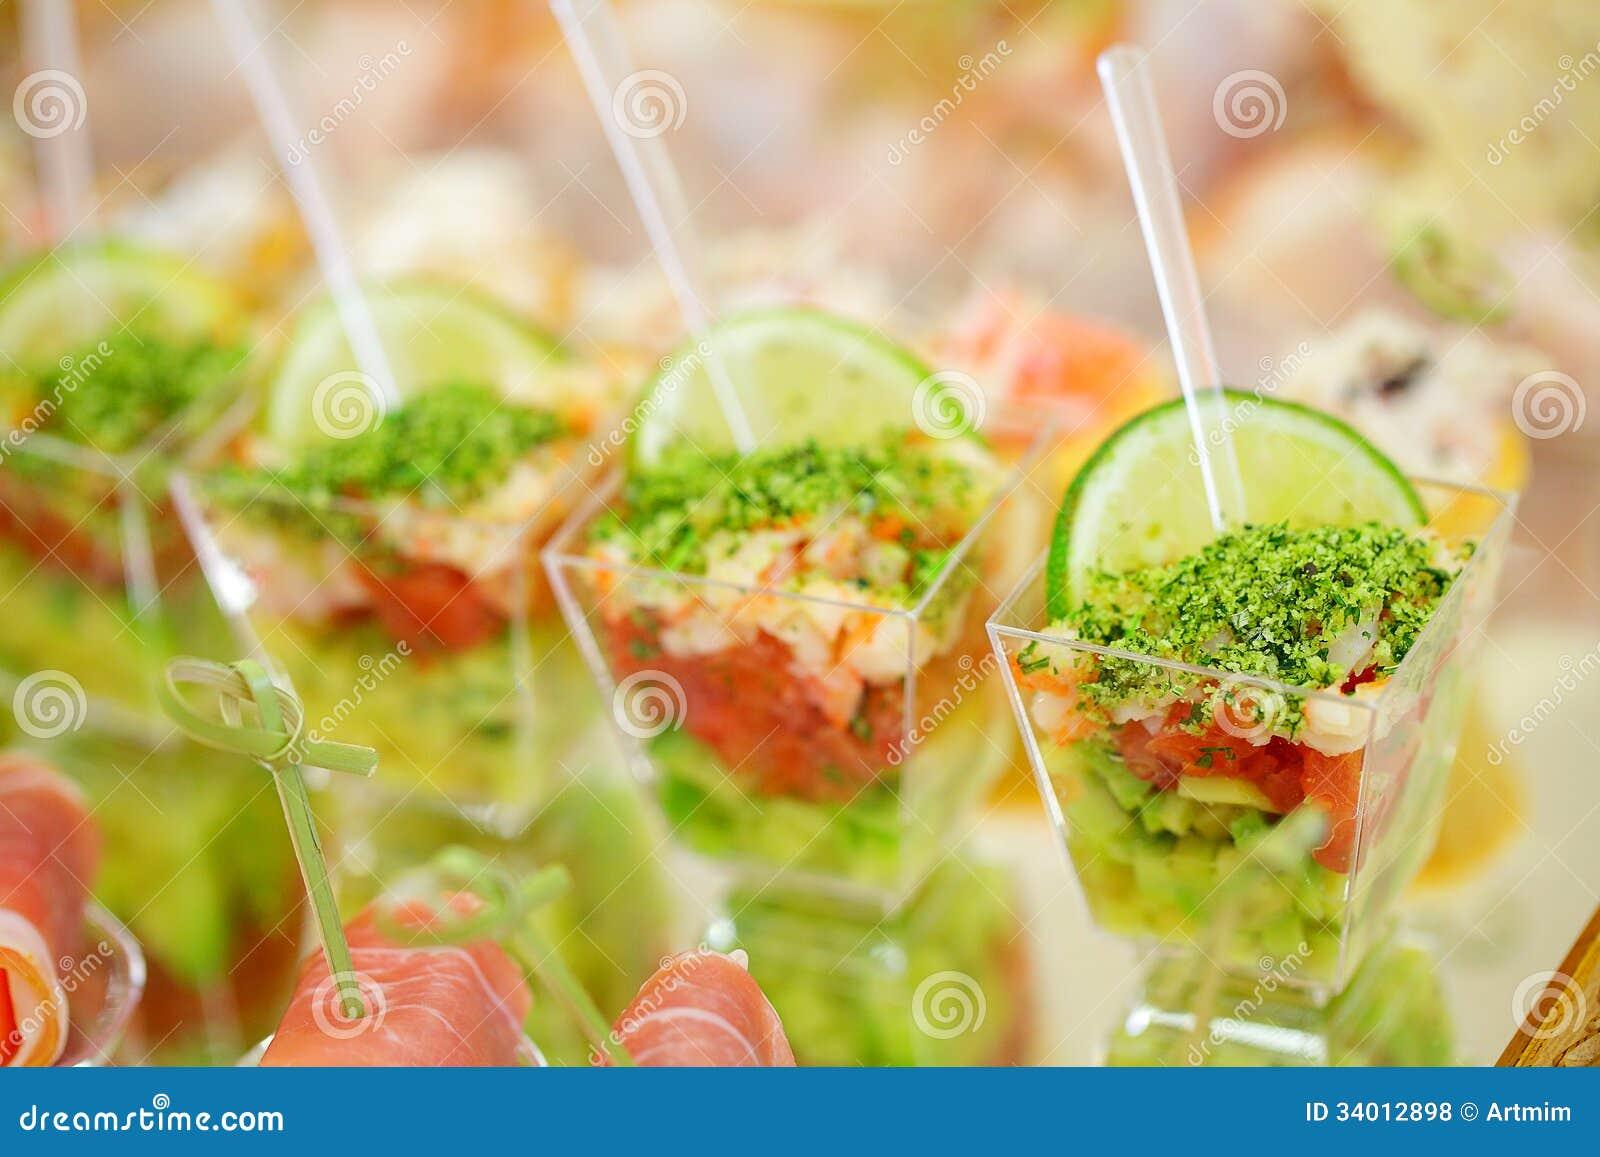 Appetizers, gourmet food